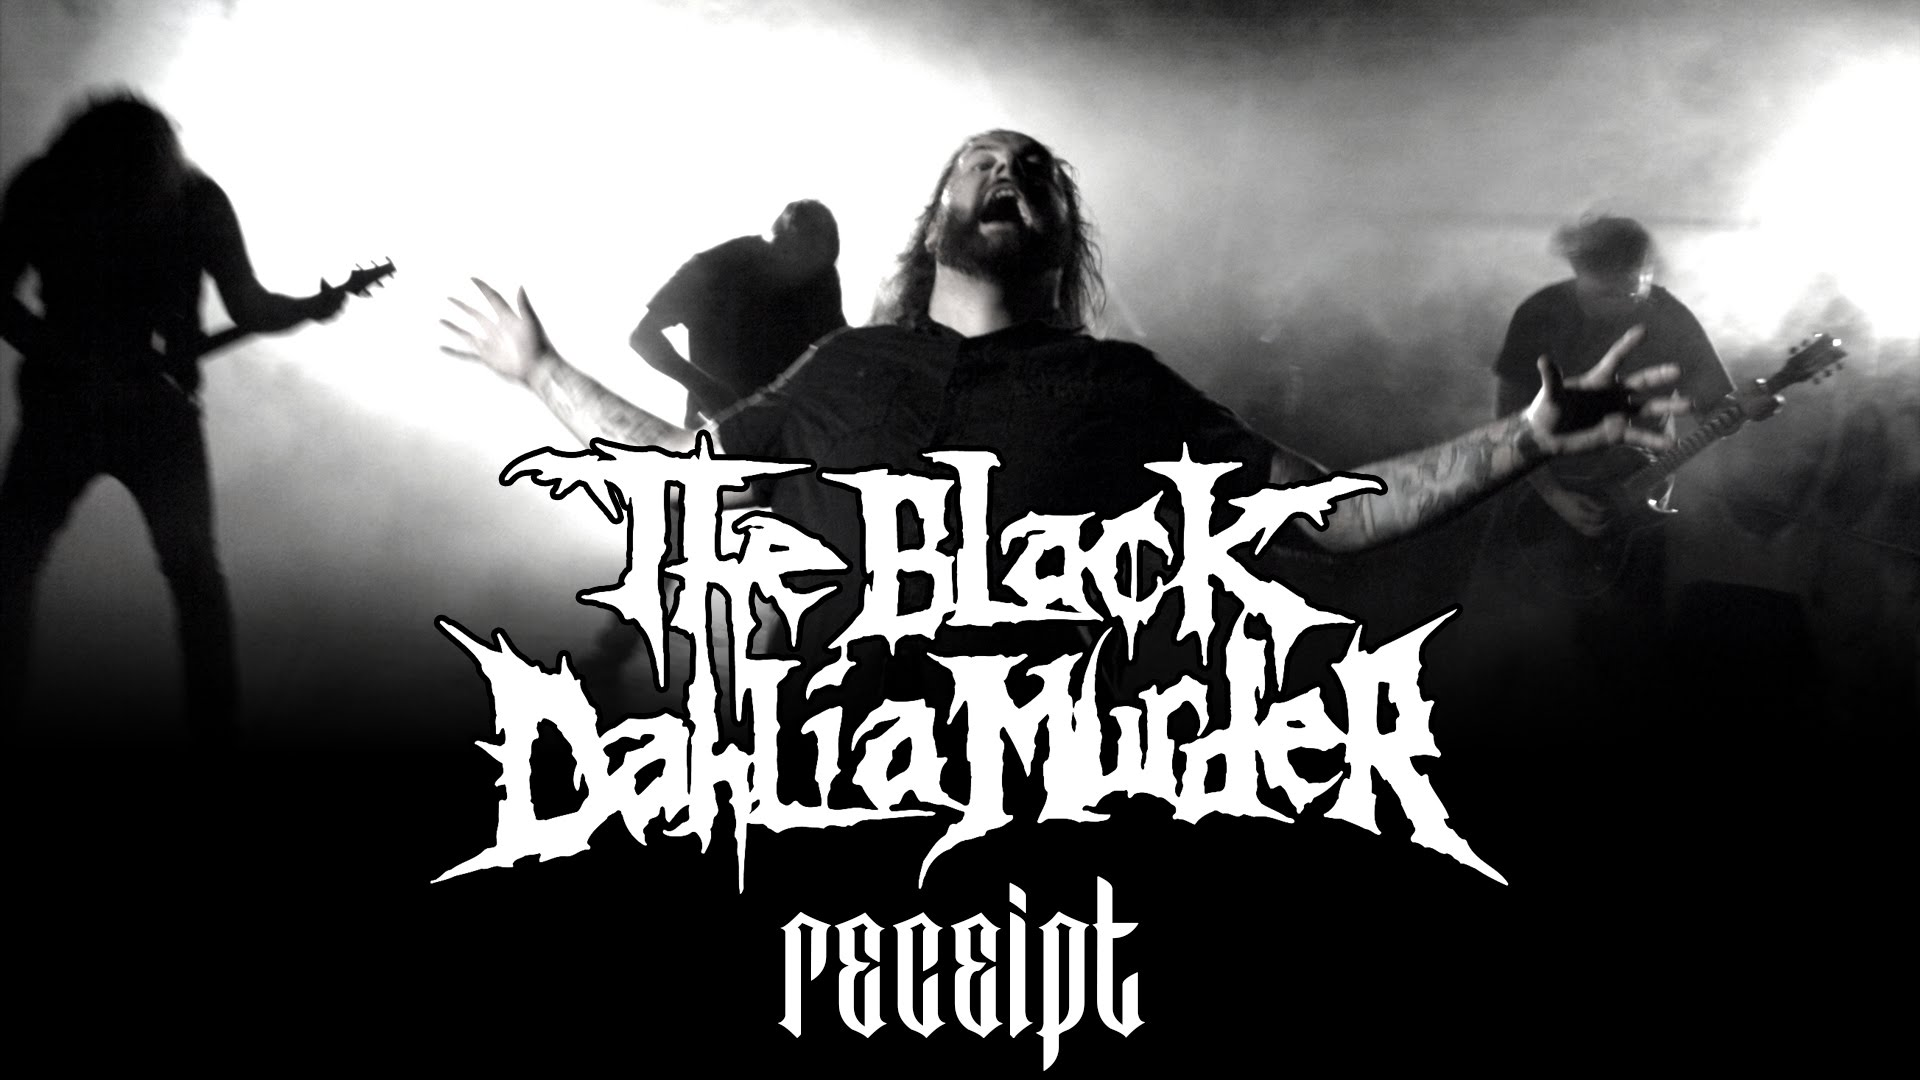 The Black Dahlia Murder 'Receipt' (OFFICIAL VIDEO)